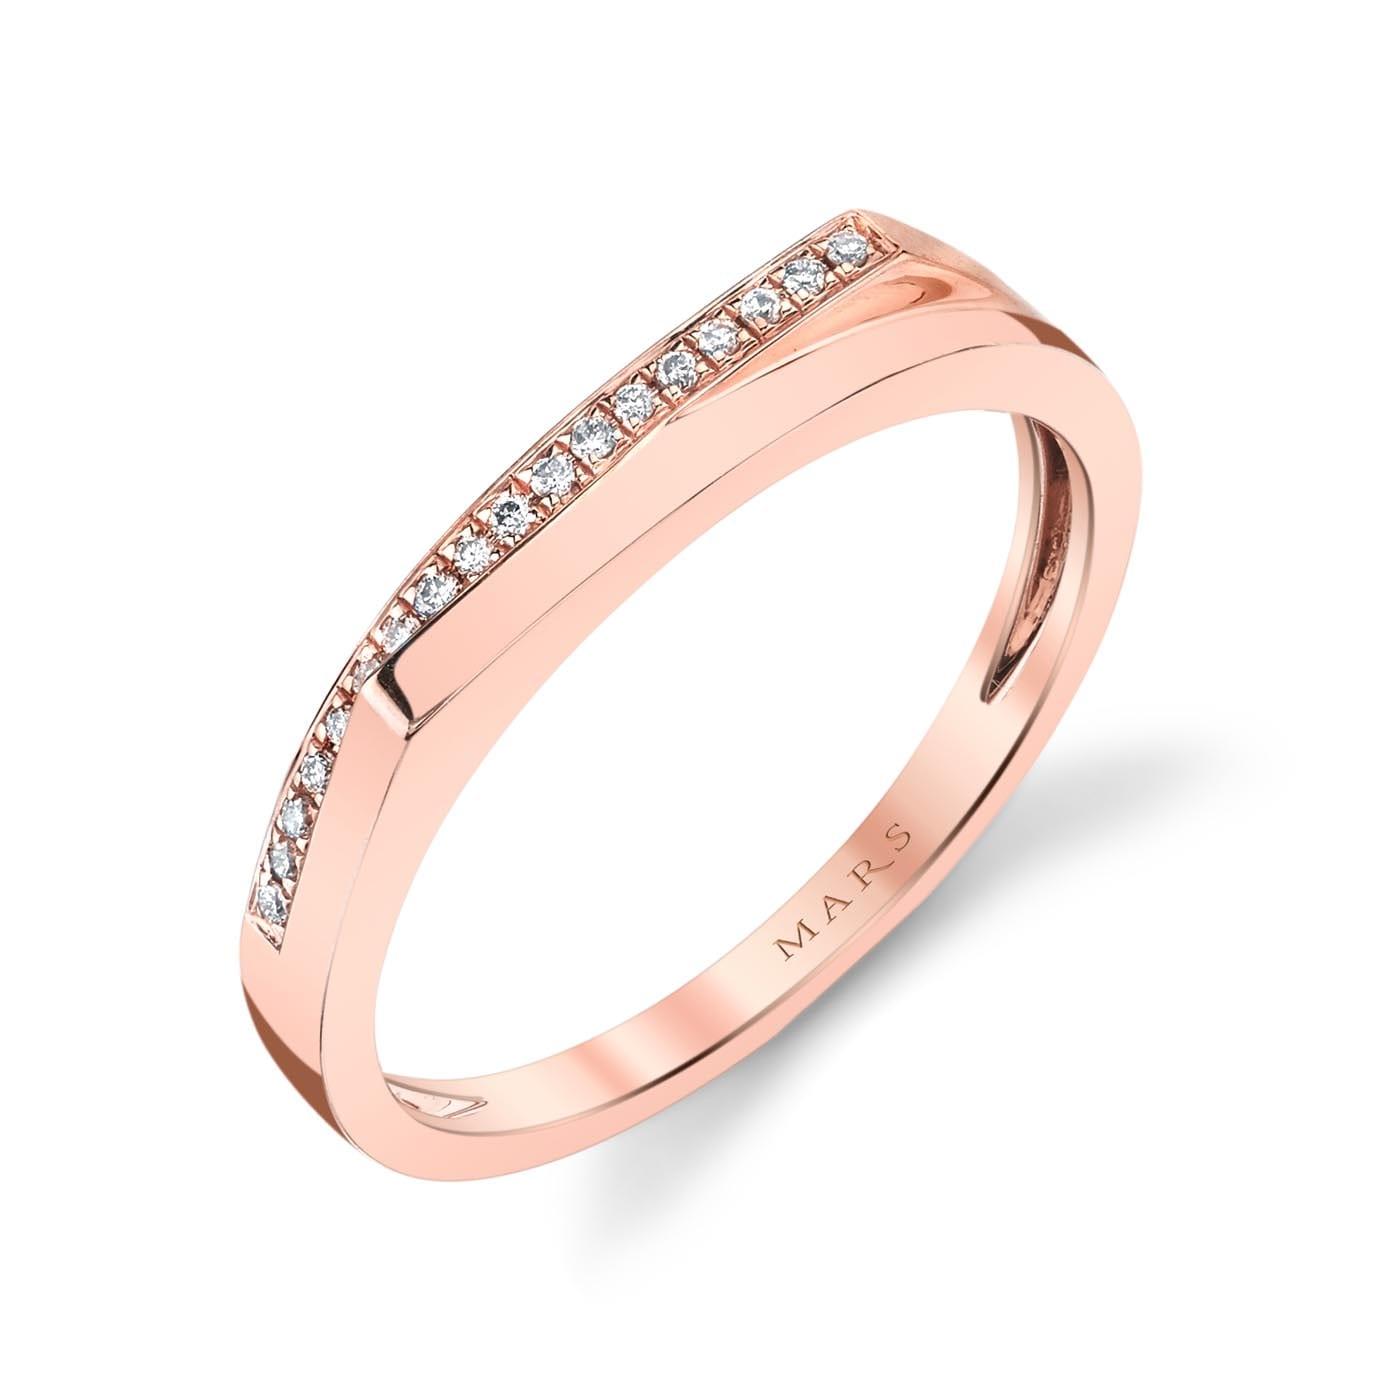 Diamond Ring - Fashion Band Style #: MARS-26890